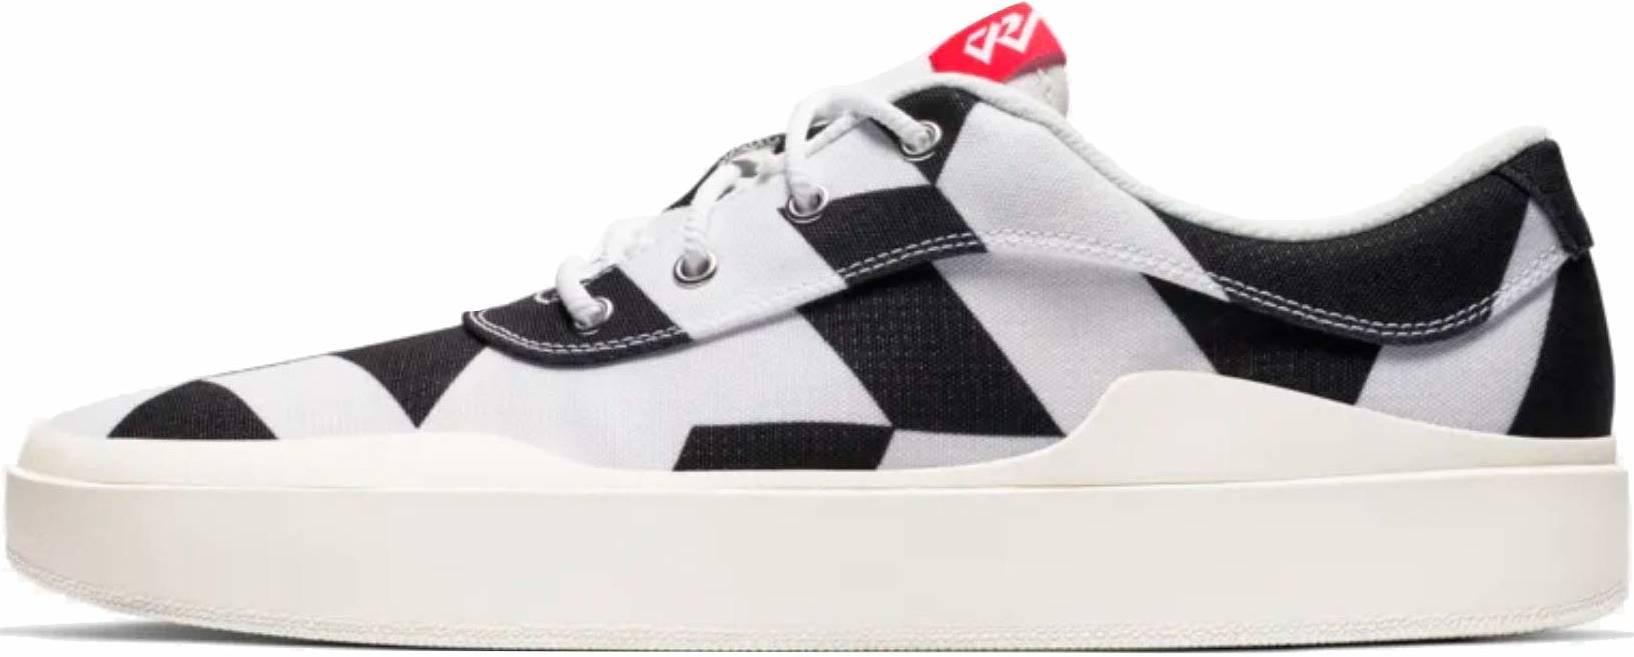 Jordan casual sneakers | RunRepeat